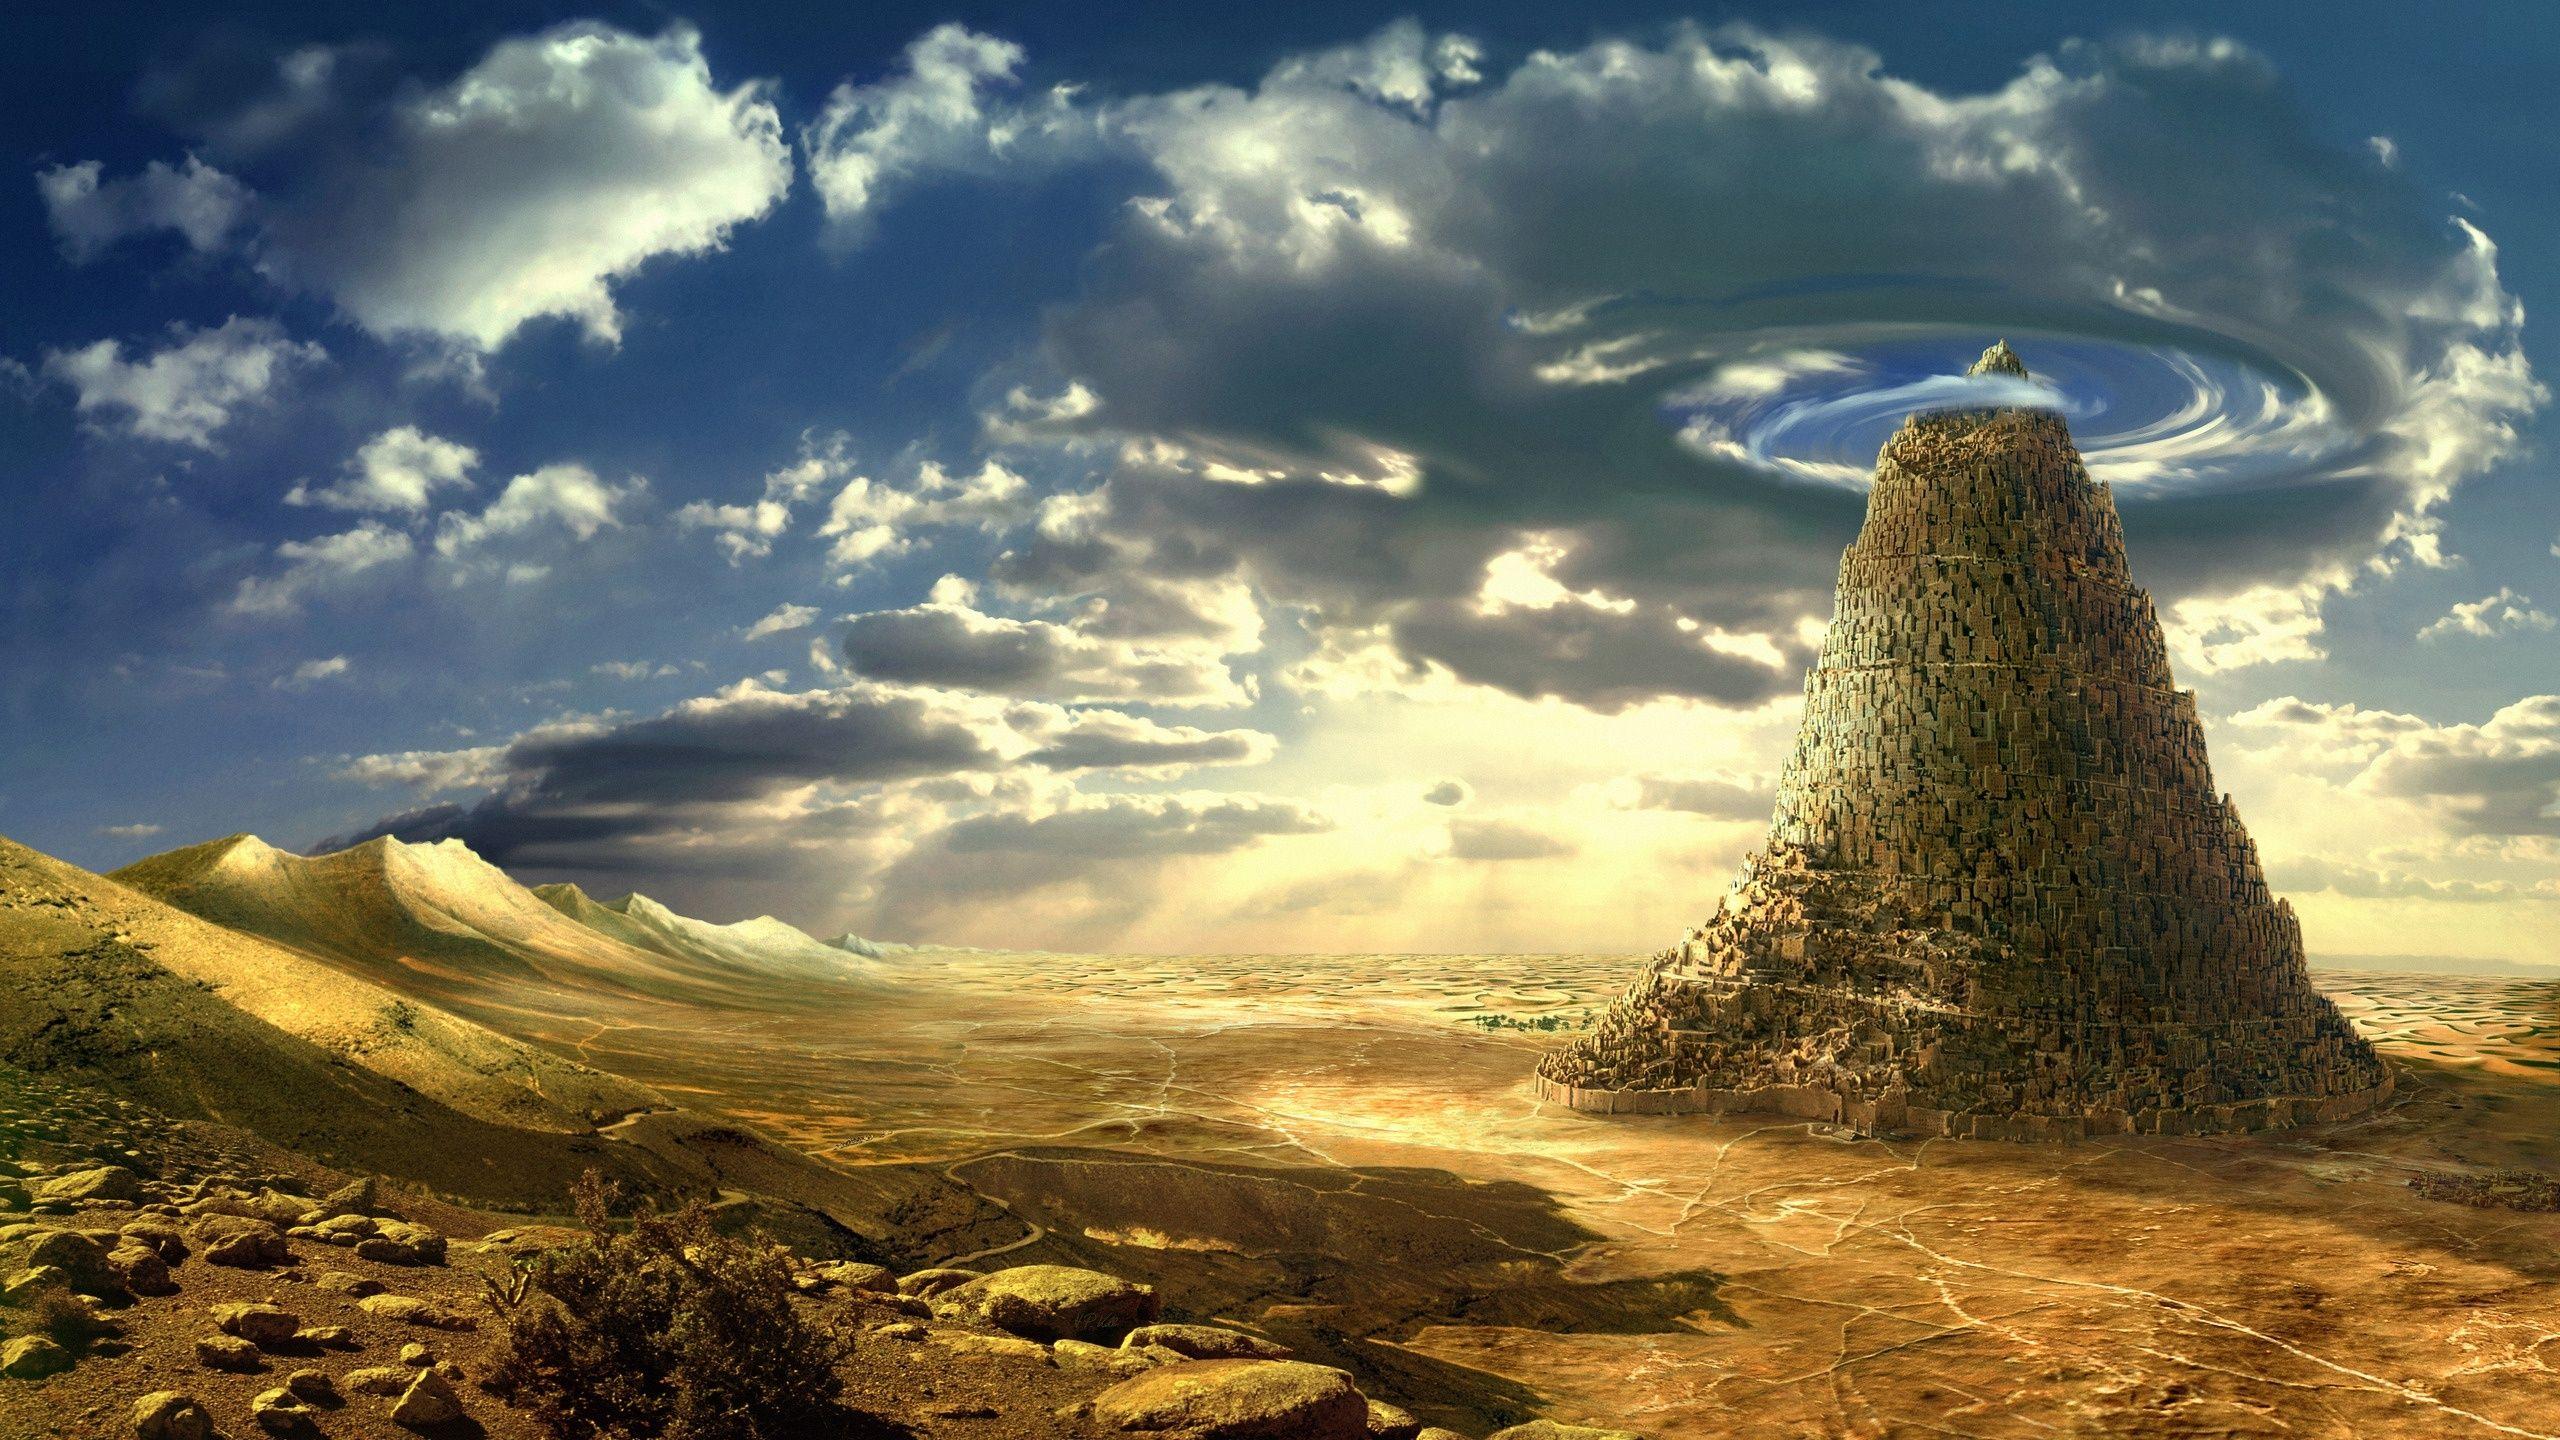 Download 2560x1440 Desert Superb Fantasy Wallpaper Beautiful Wallpaper Hd Beautiful Wallpapers Fantasy Landscape